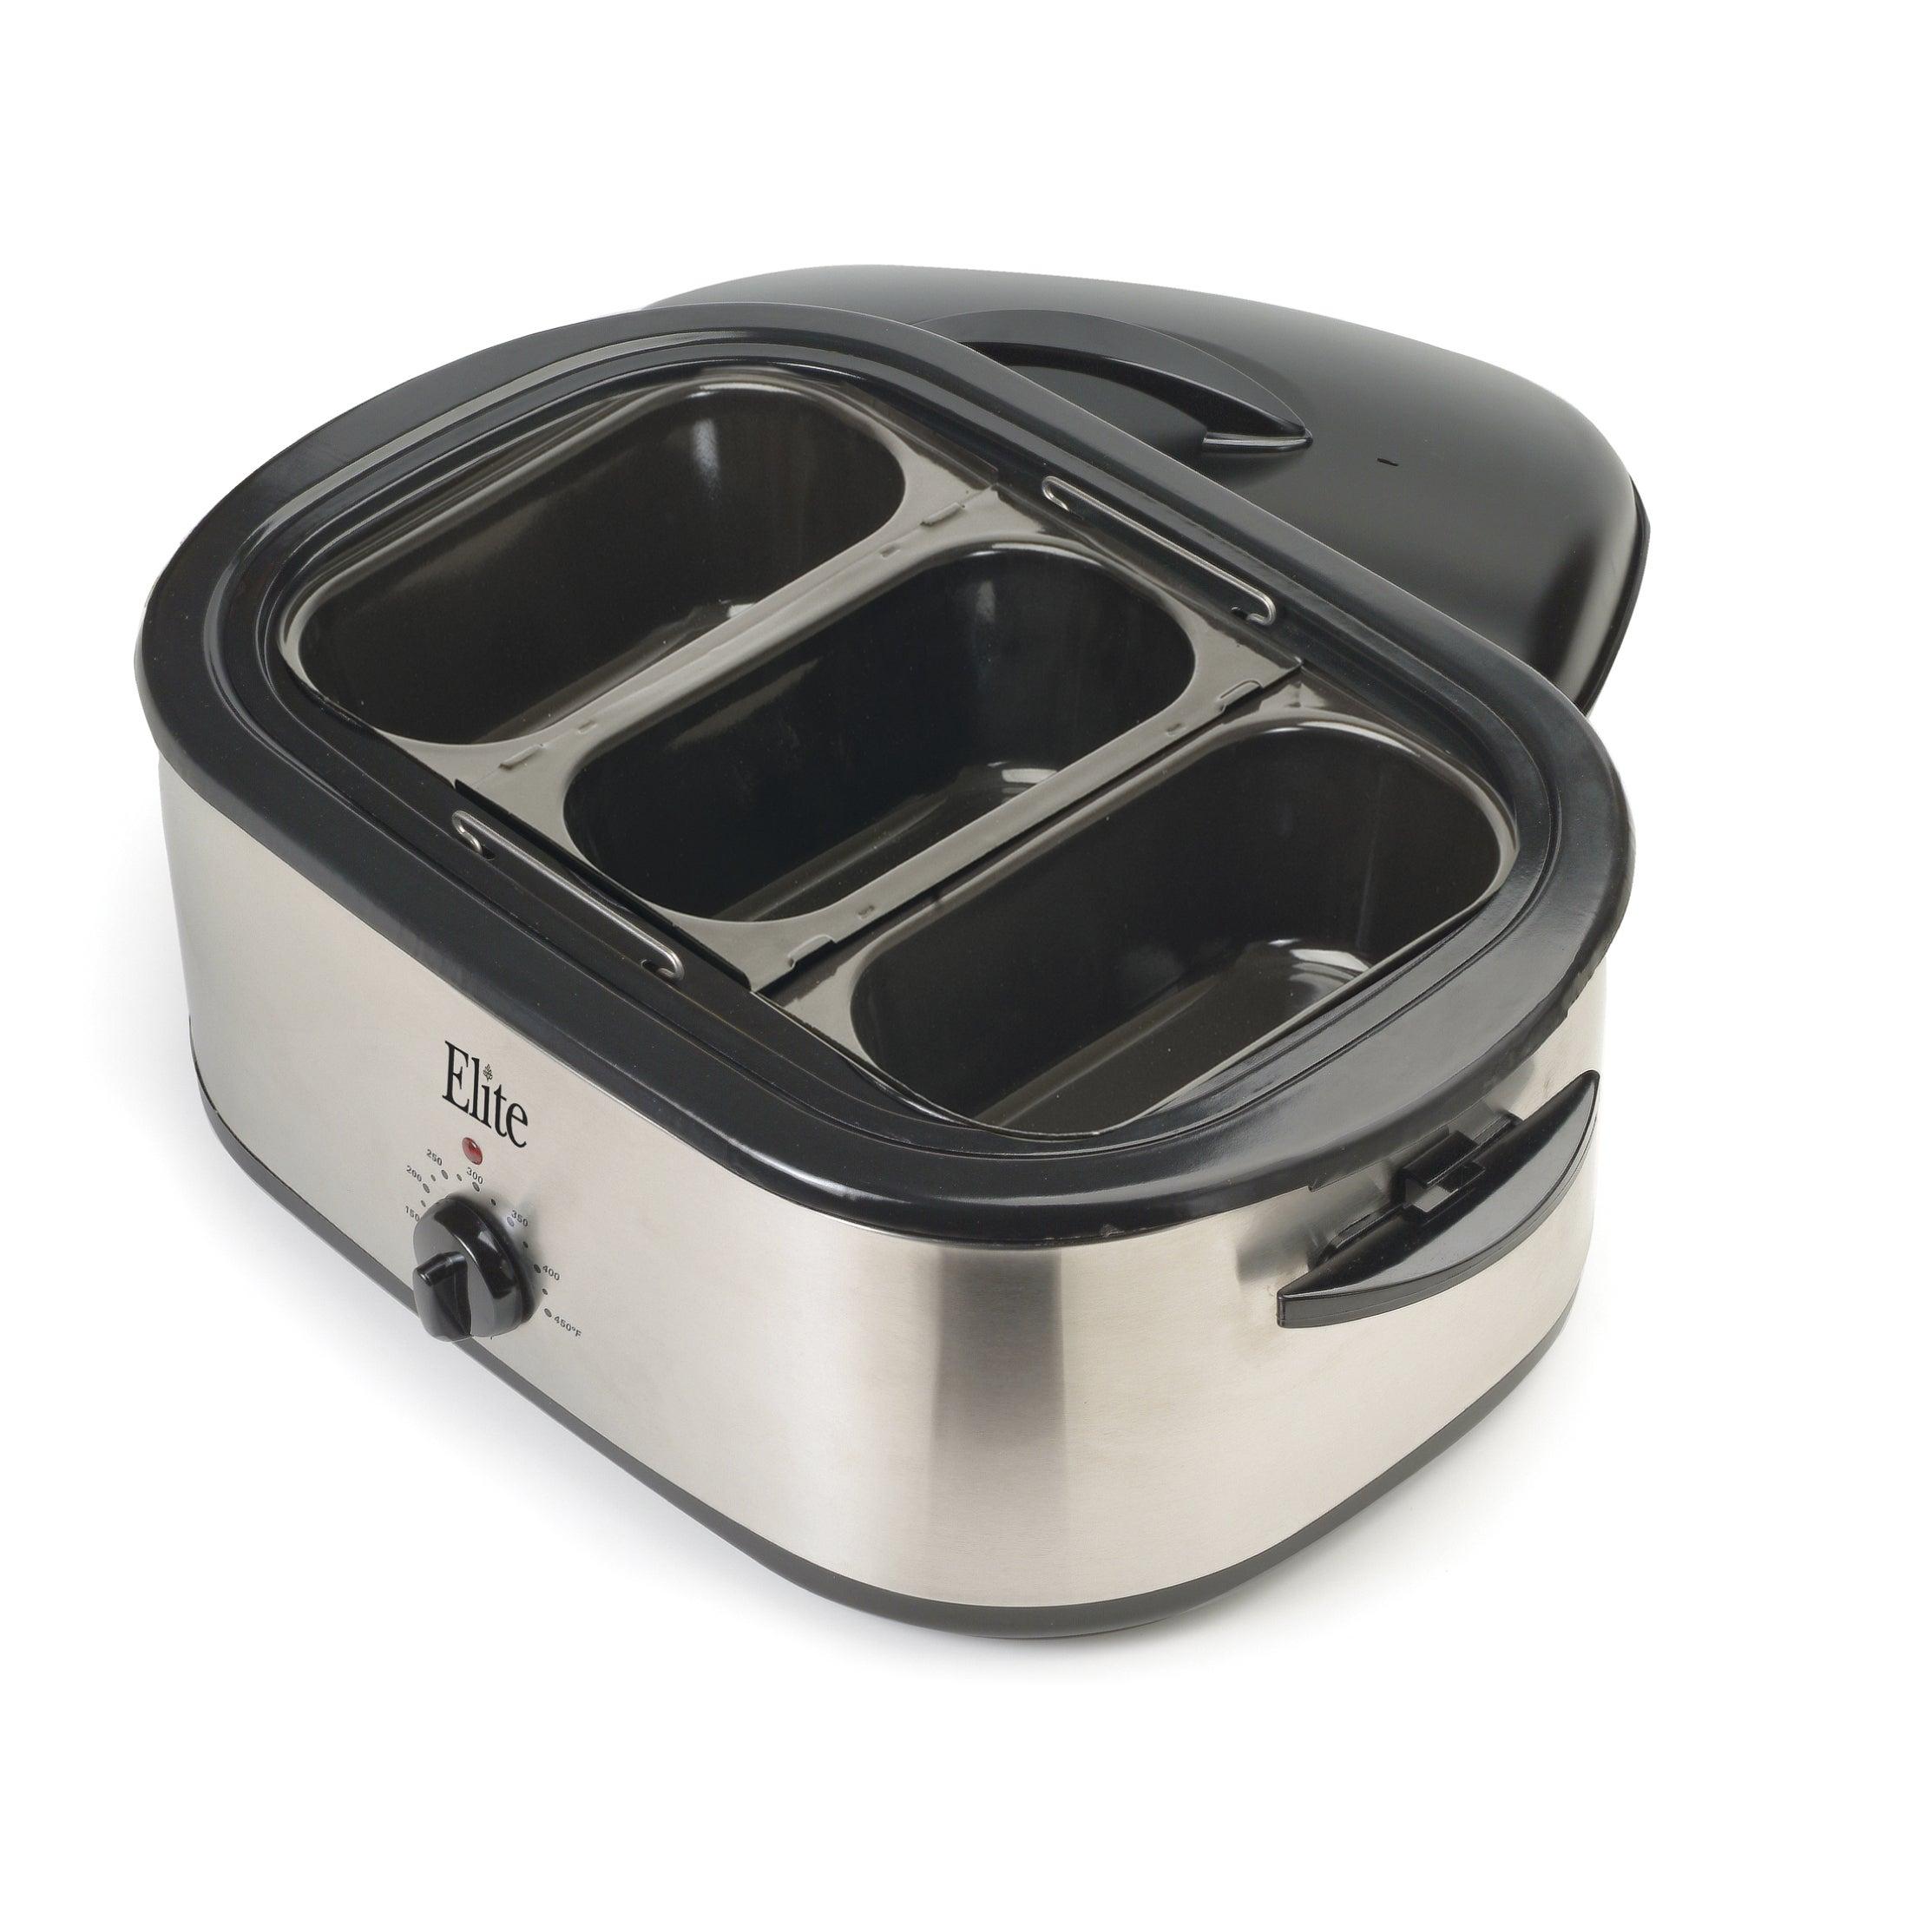 Elite Systems Platinum (White) ERO-210B 18-quart Roaster Oven (Metal)